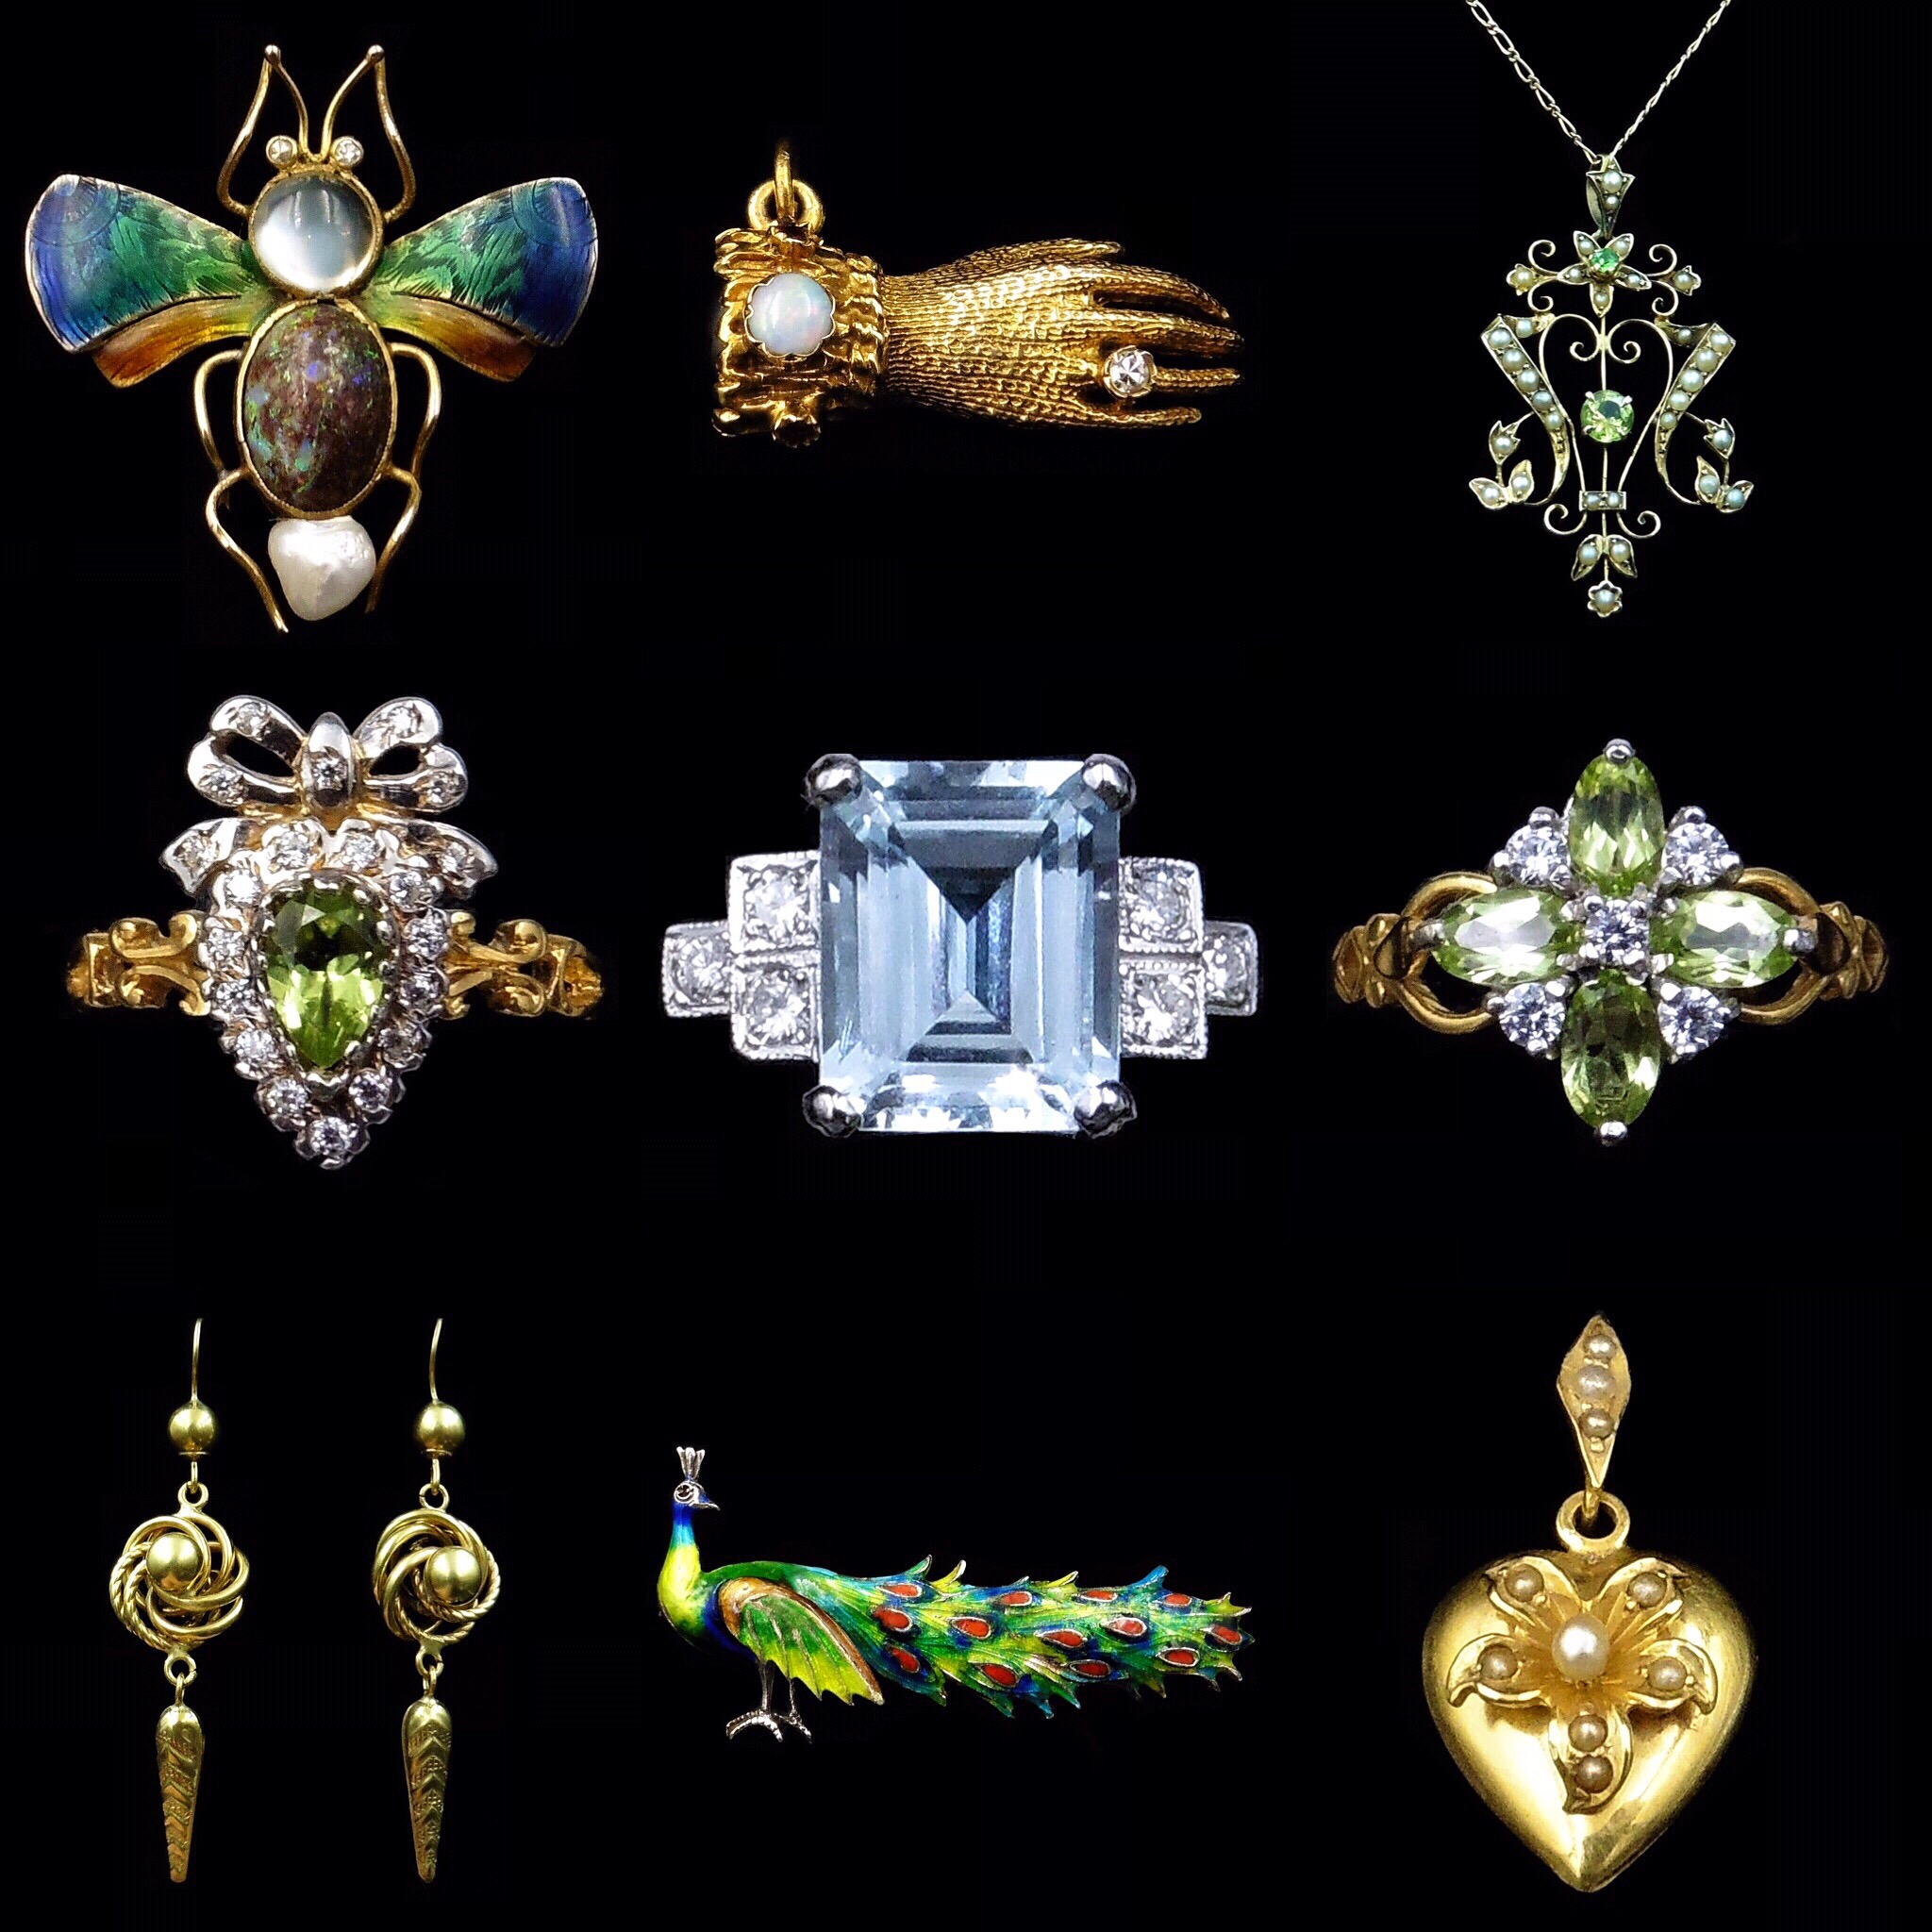 Lancastrian Jewellers image (1 of 6)